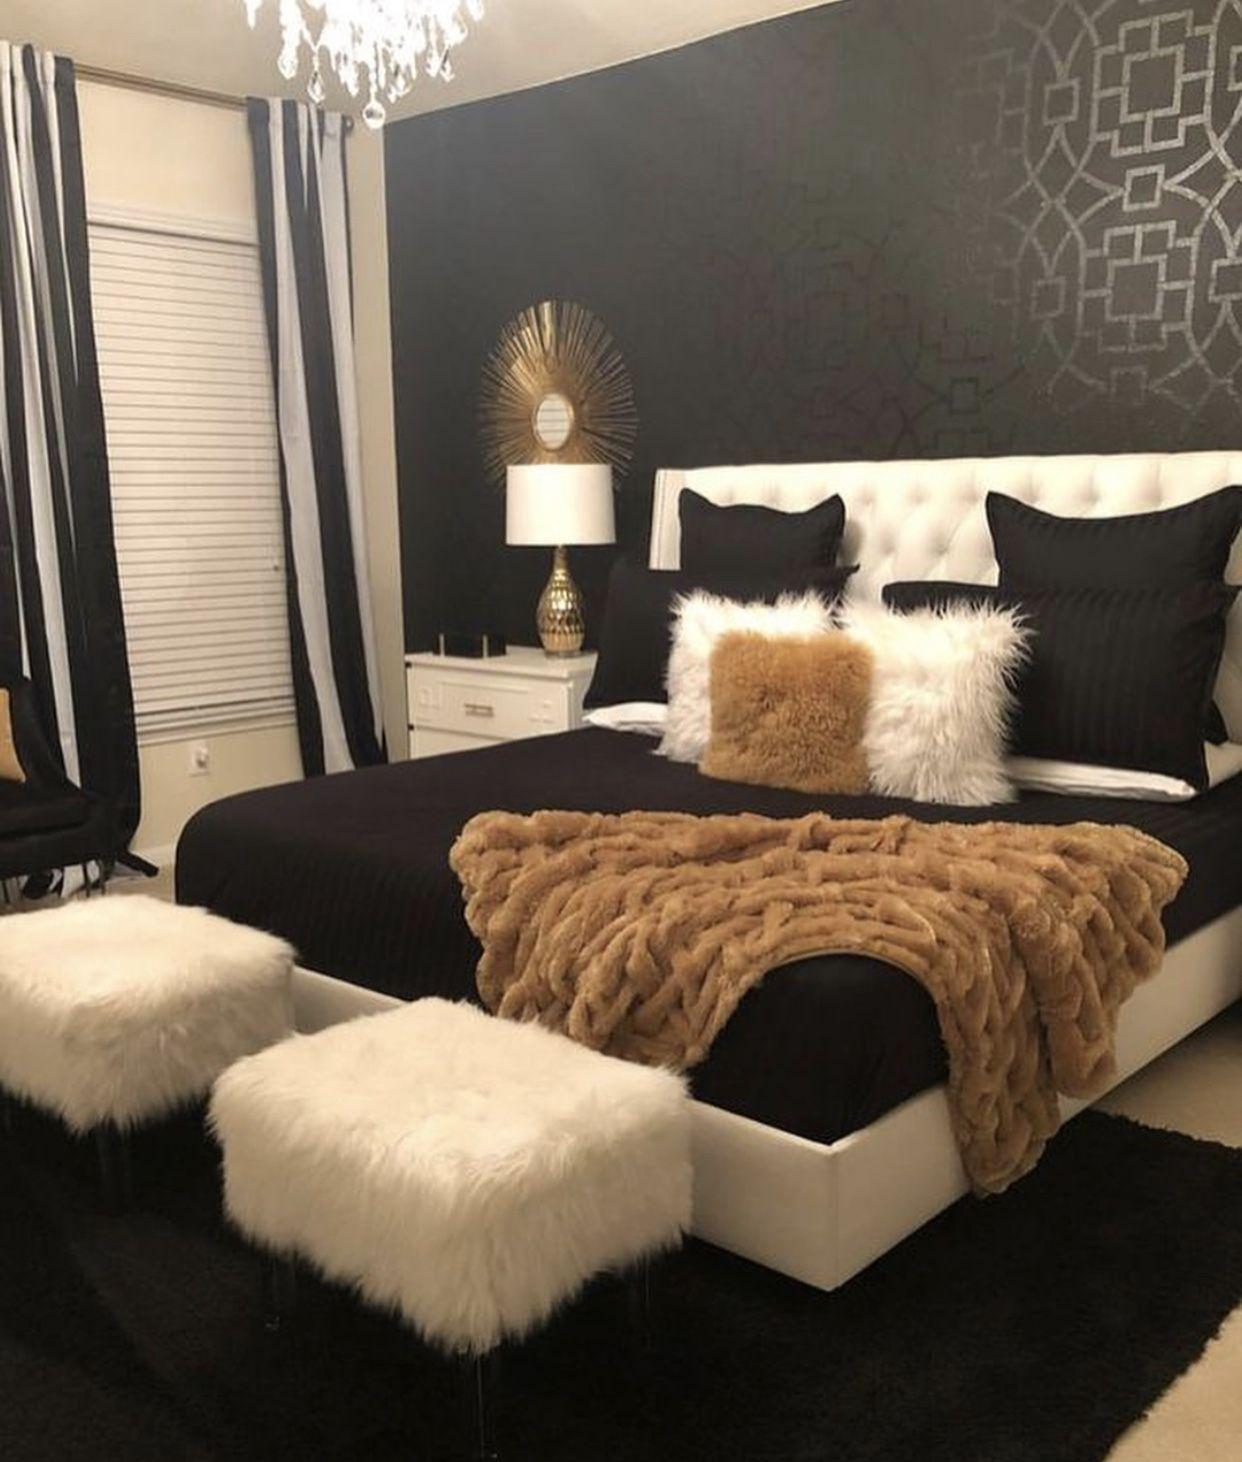 Perfect bedroom also kamar tidur utama in pinterest rh